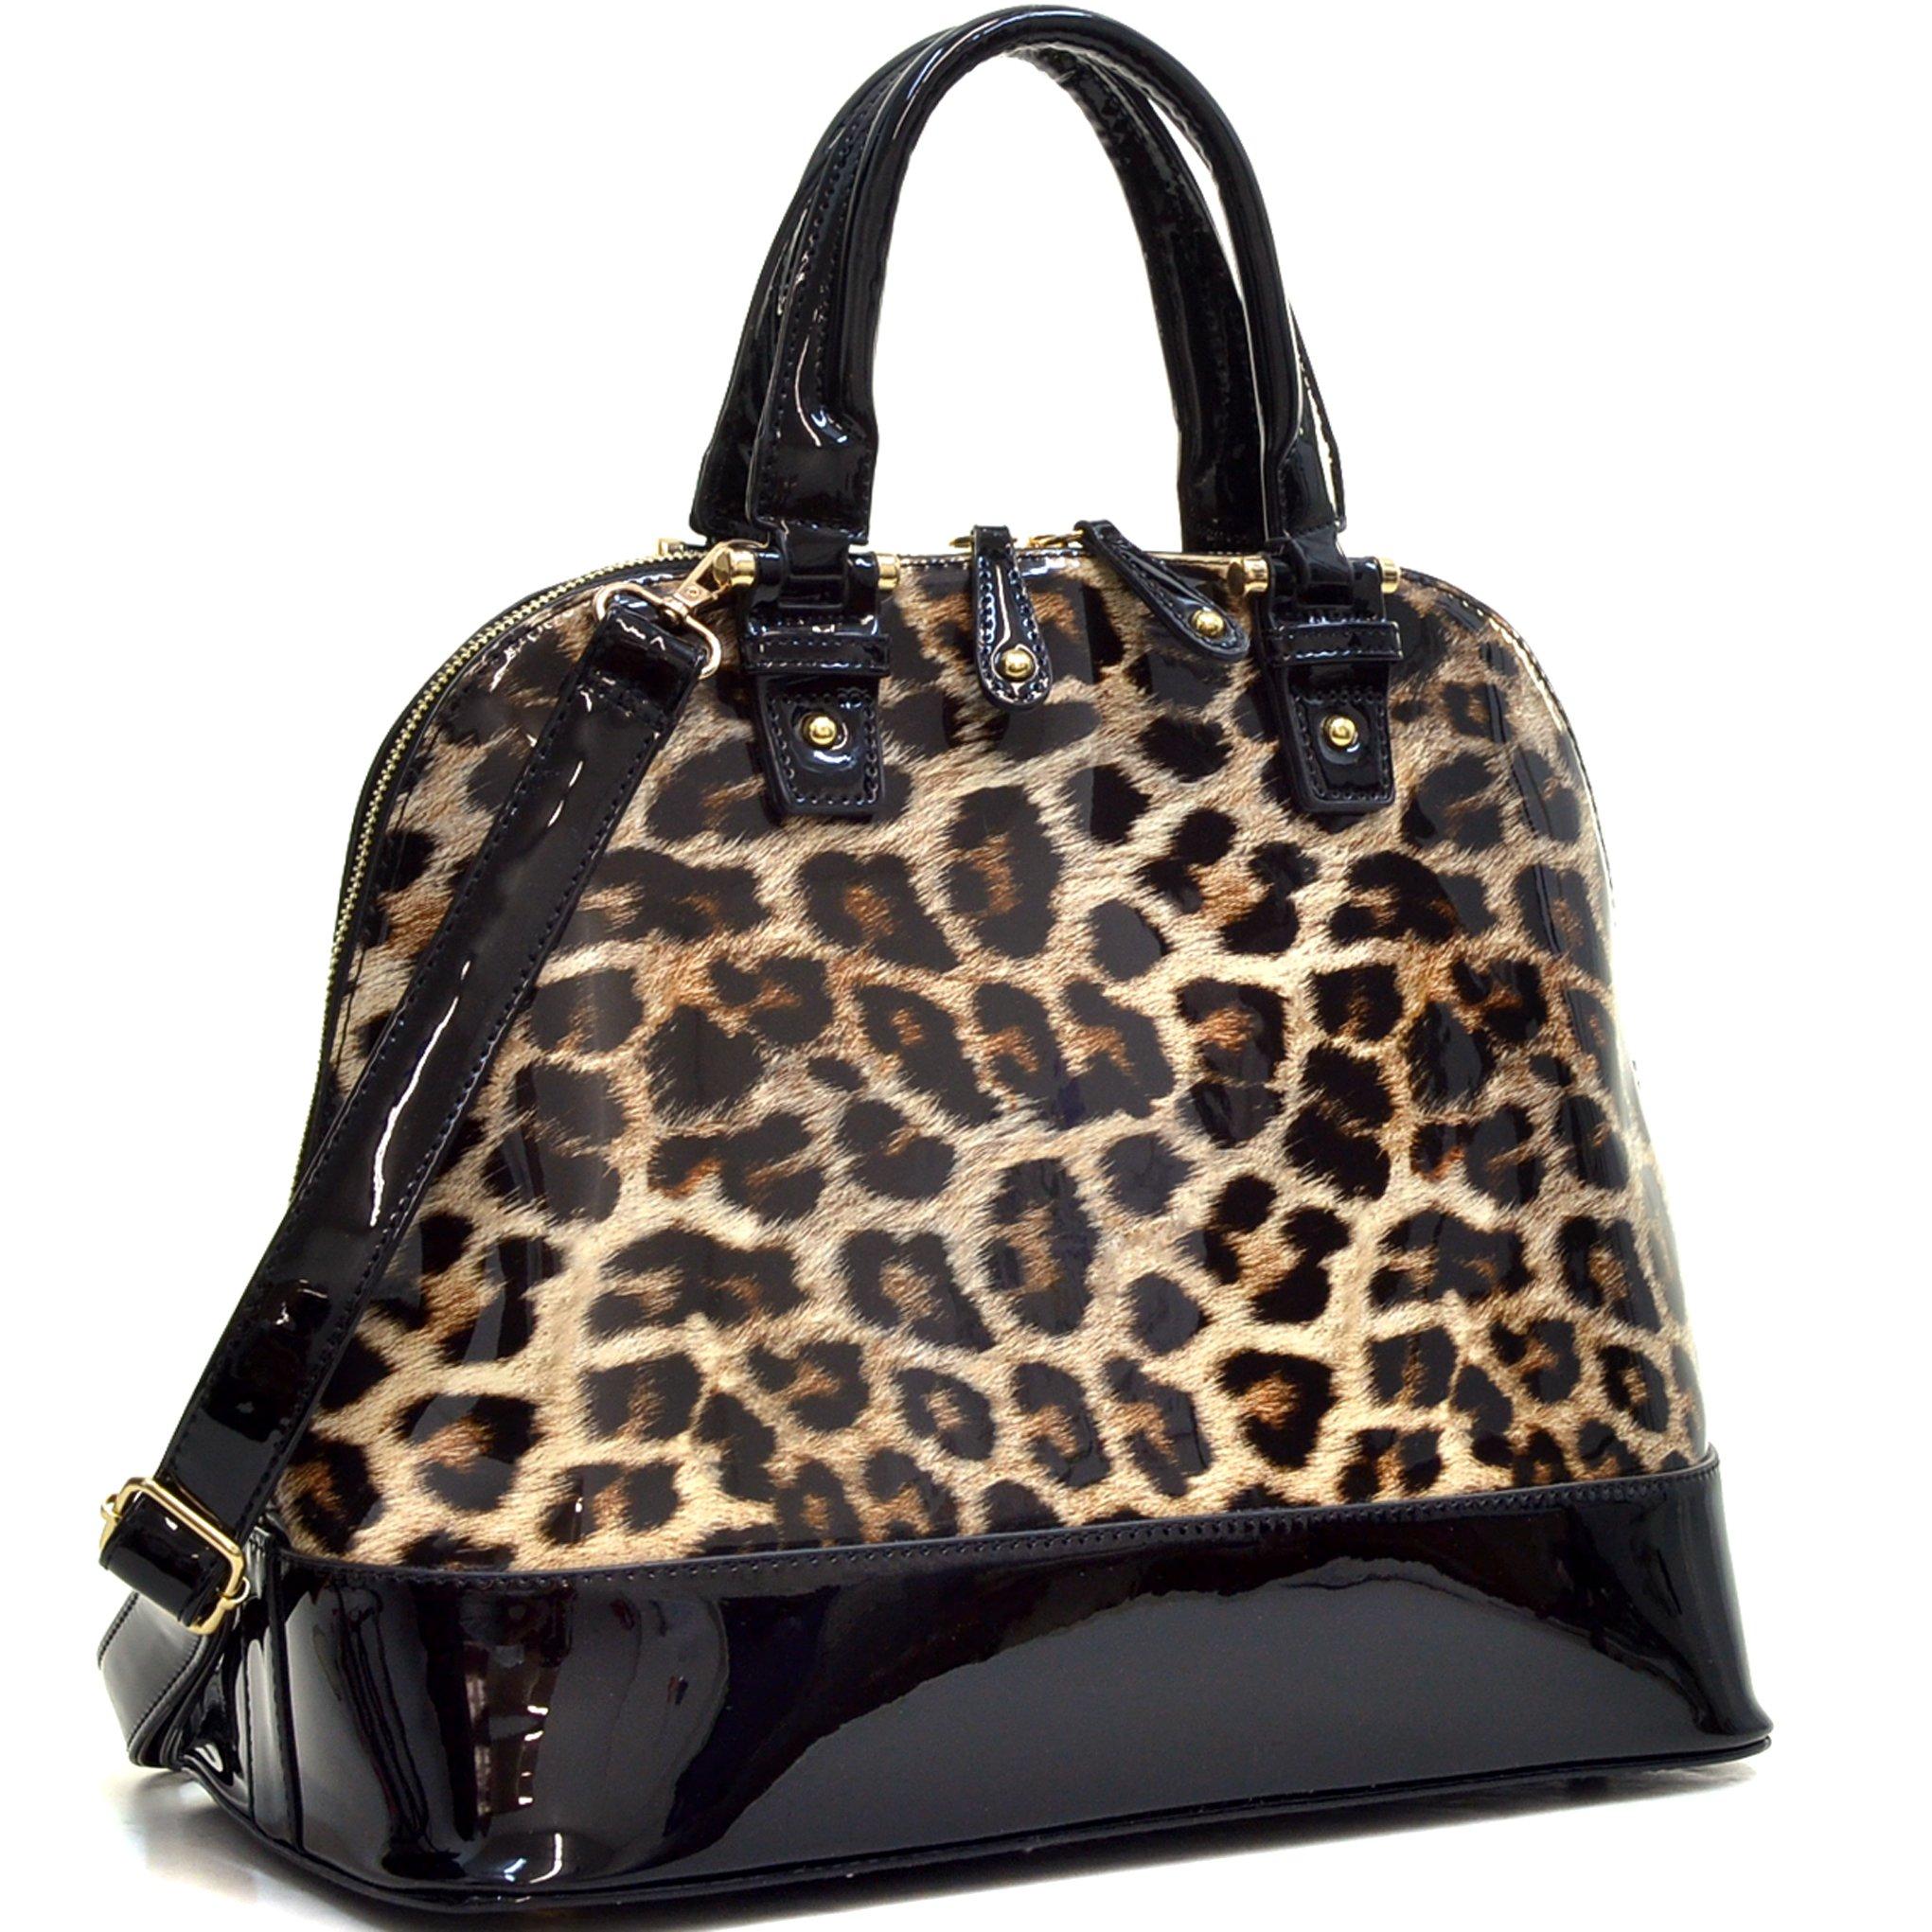 Large Dome Satchel Shell Shape Bag Top Handle Purse Shoulder Handbag